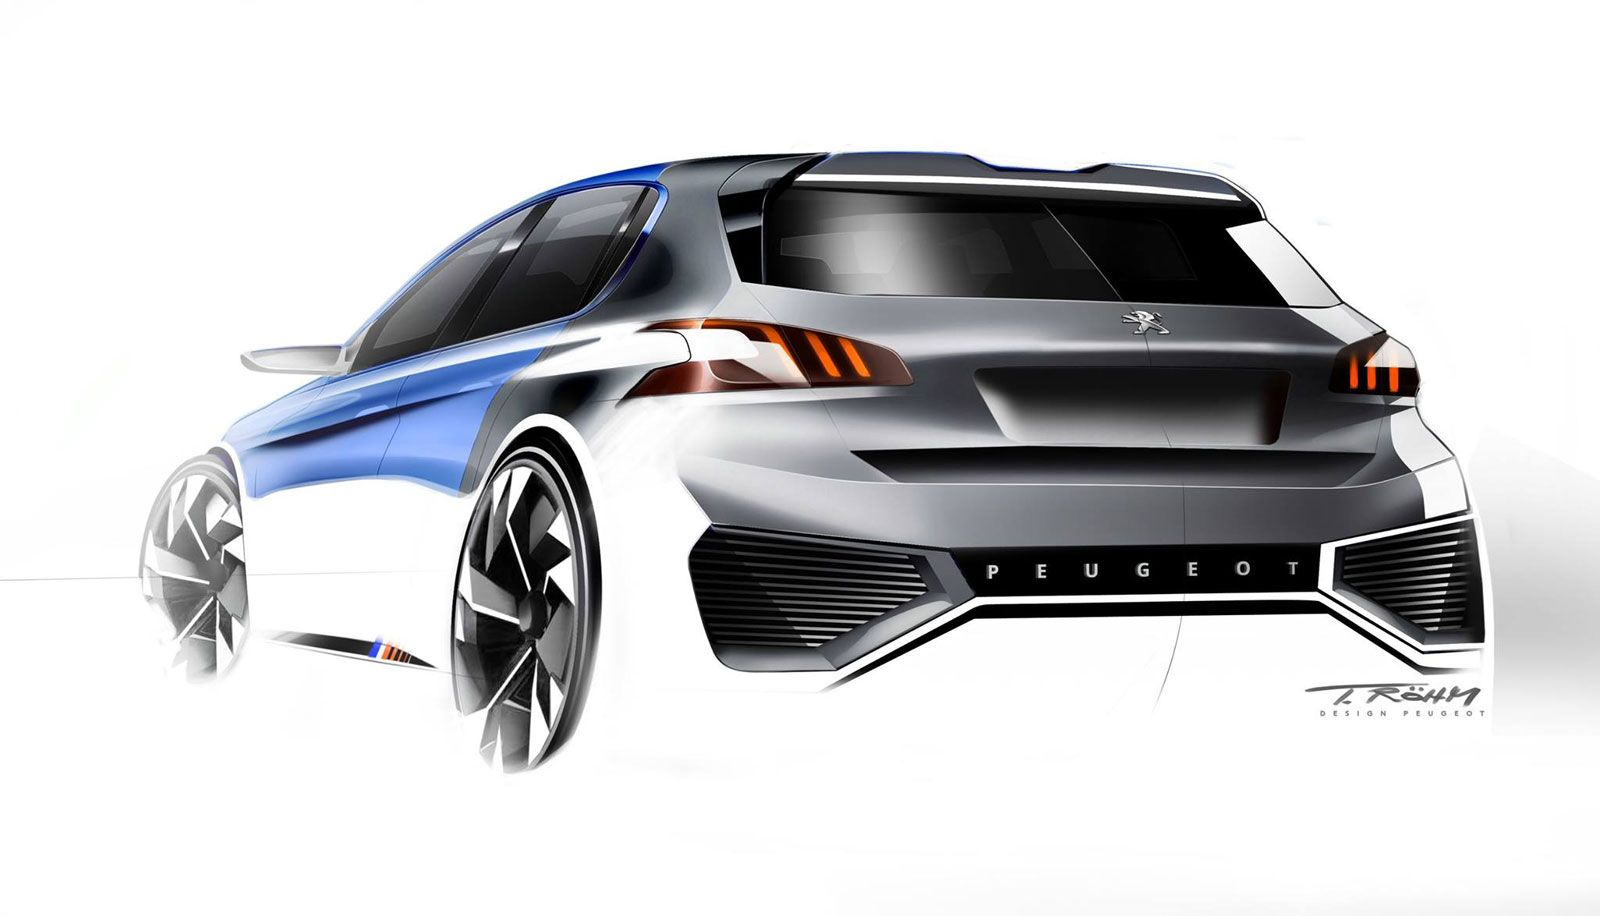 Peugeot 308 r hybrid concept design sketch by thomas rohm for Automotive exterior design jobs